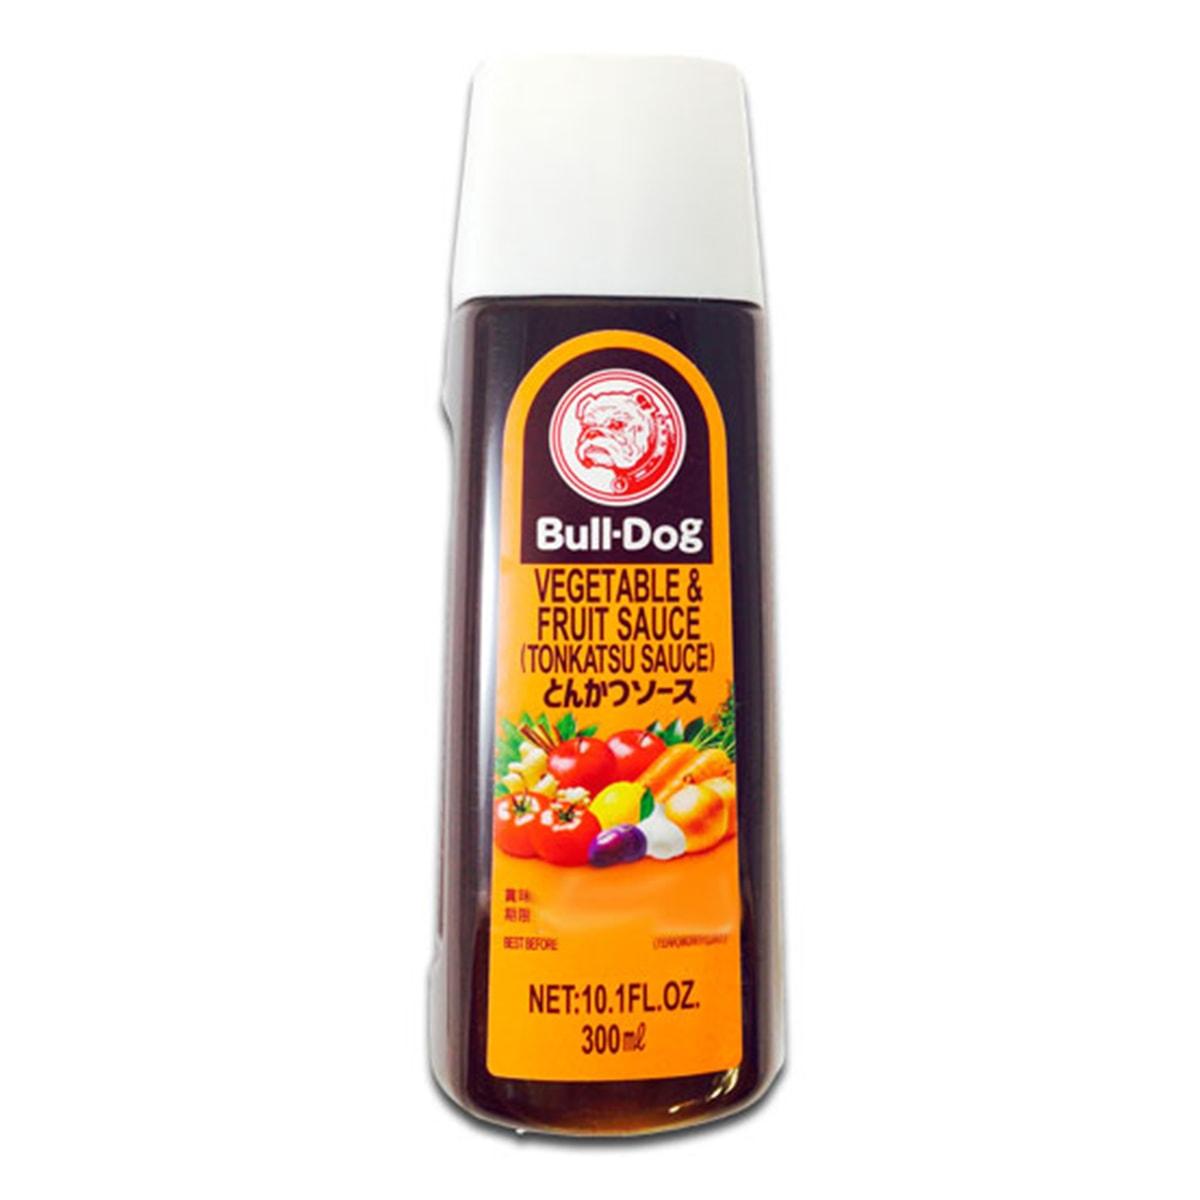 Buy Bull Dog Vegetable and Fruit Sauce (Tonkatsu Sauce) - 300 ml